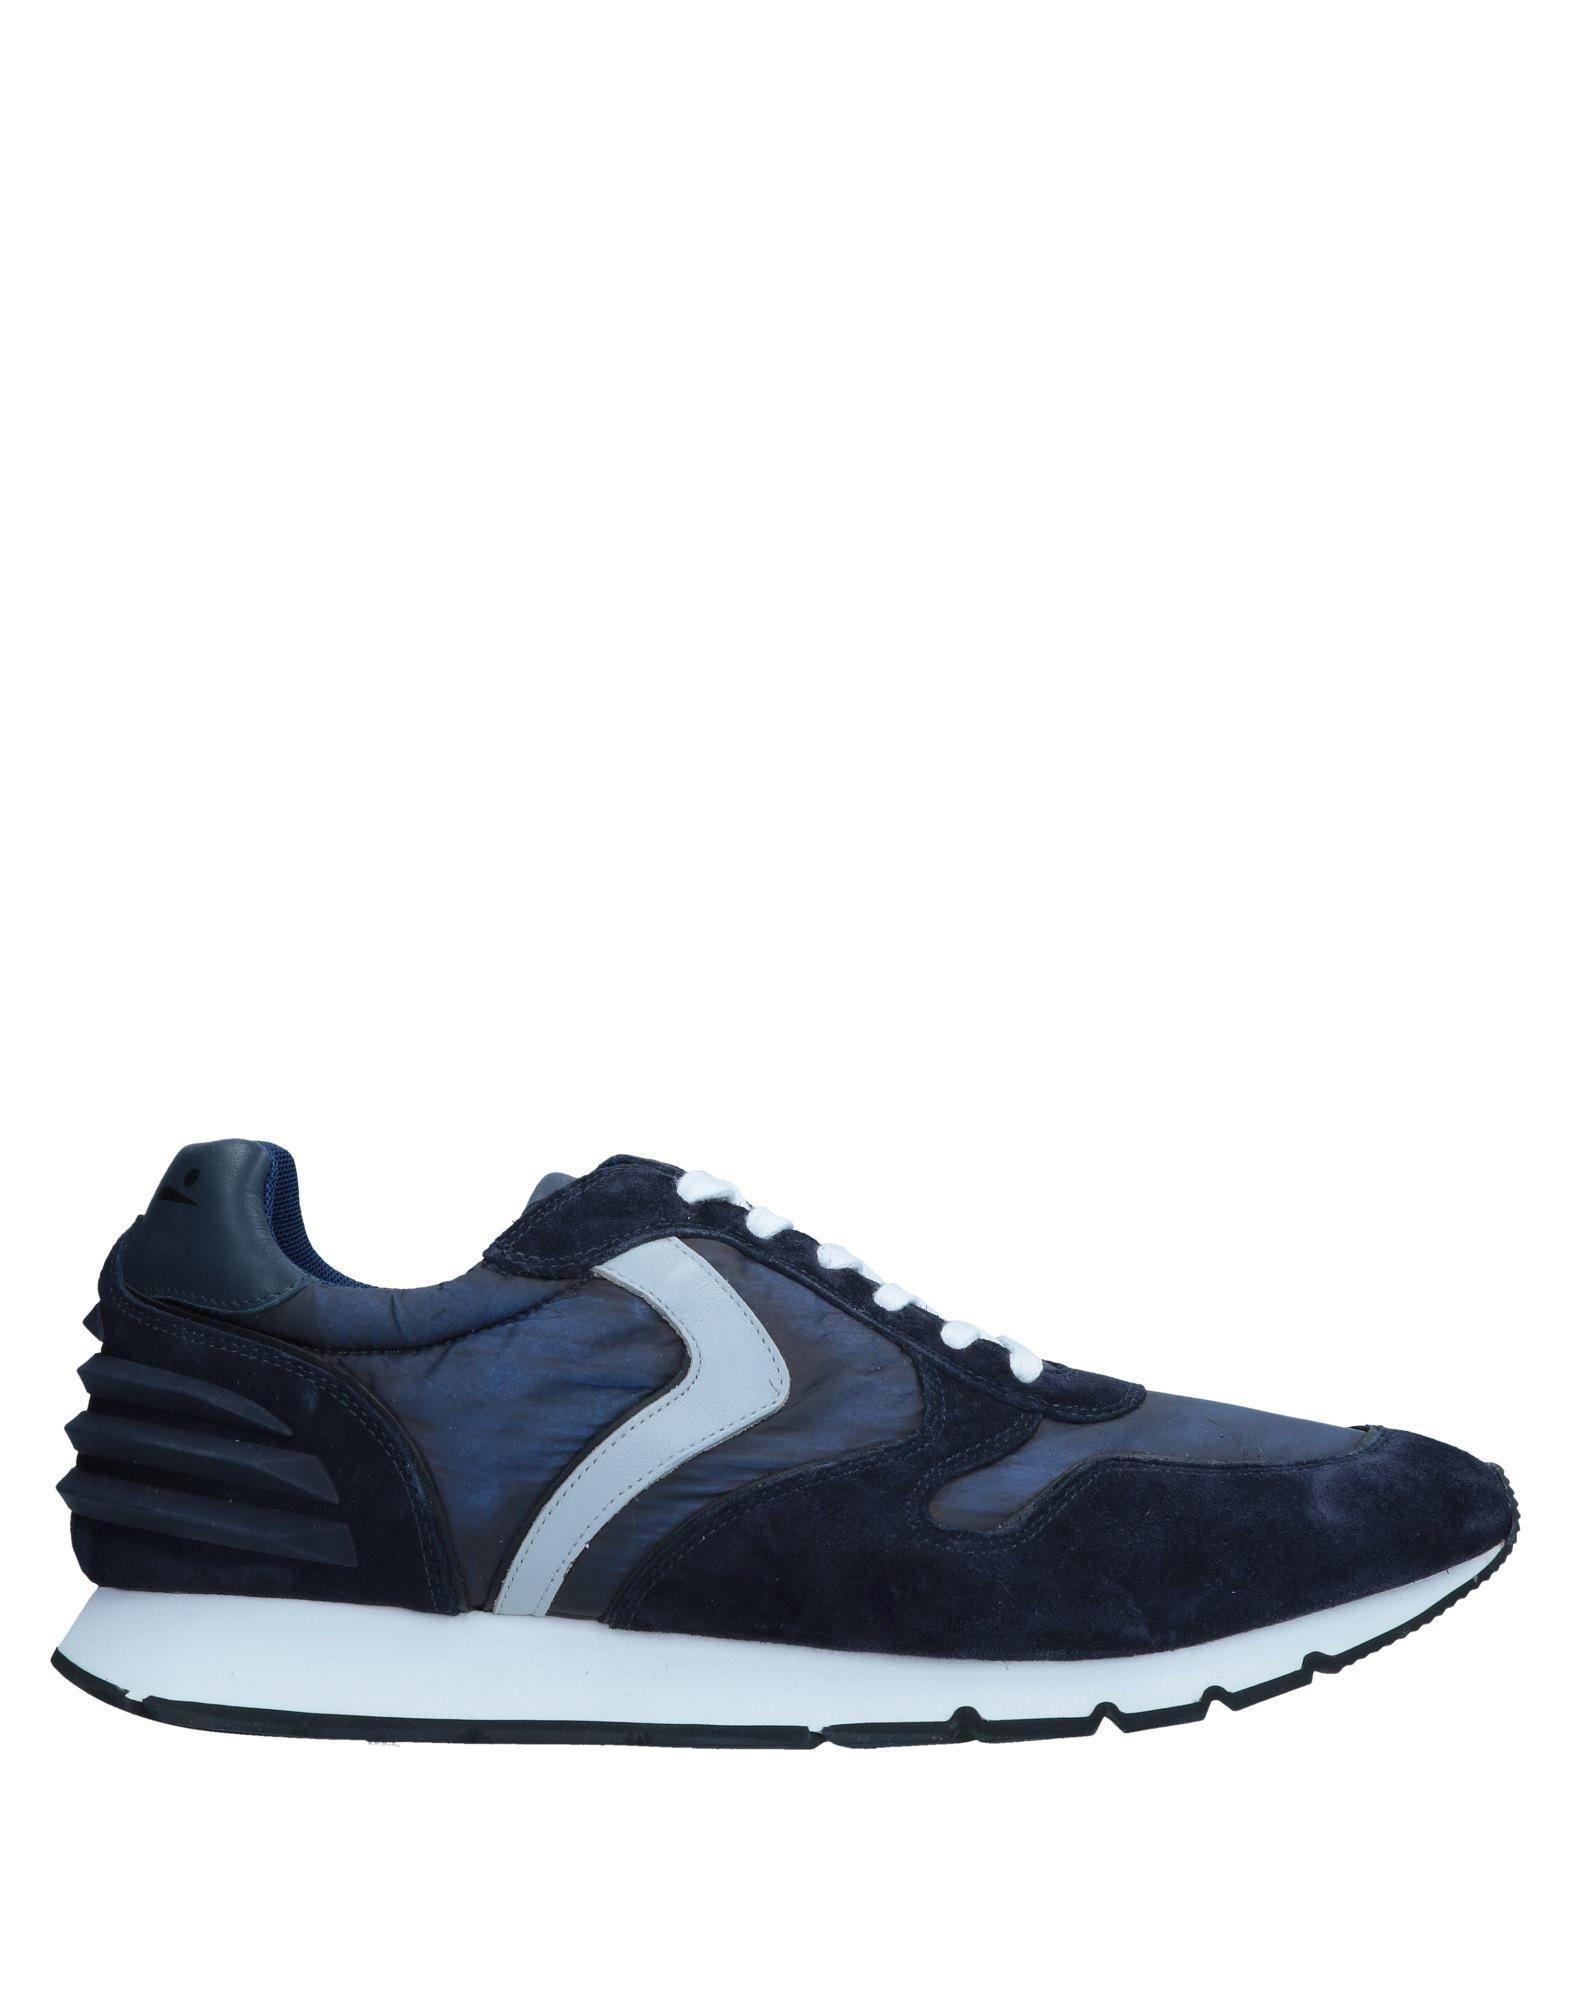 Sneakers Voile Blanche Uomo - 11545528VU